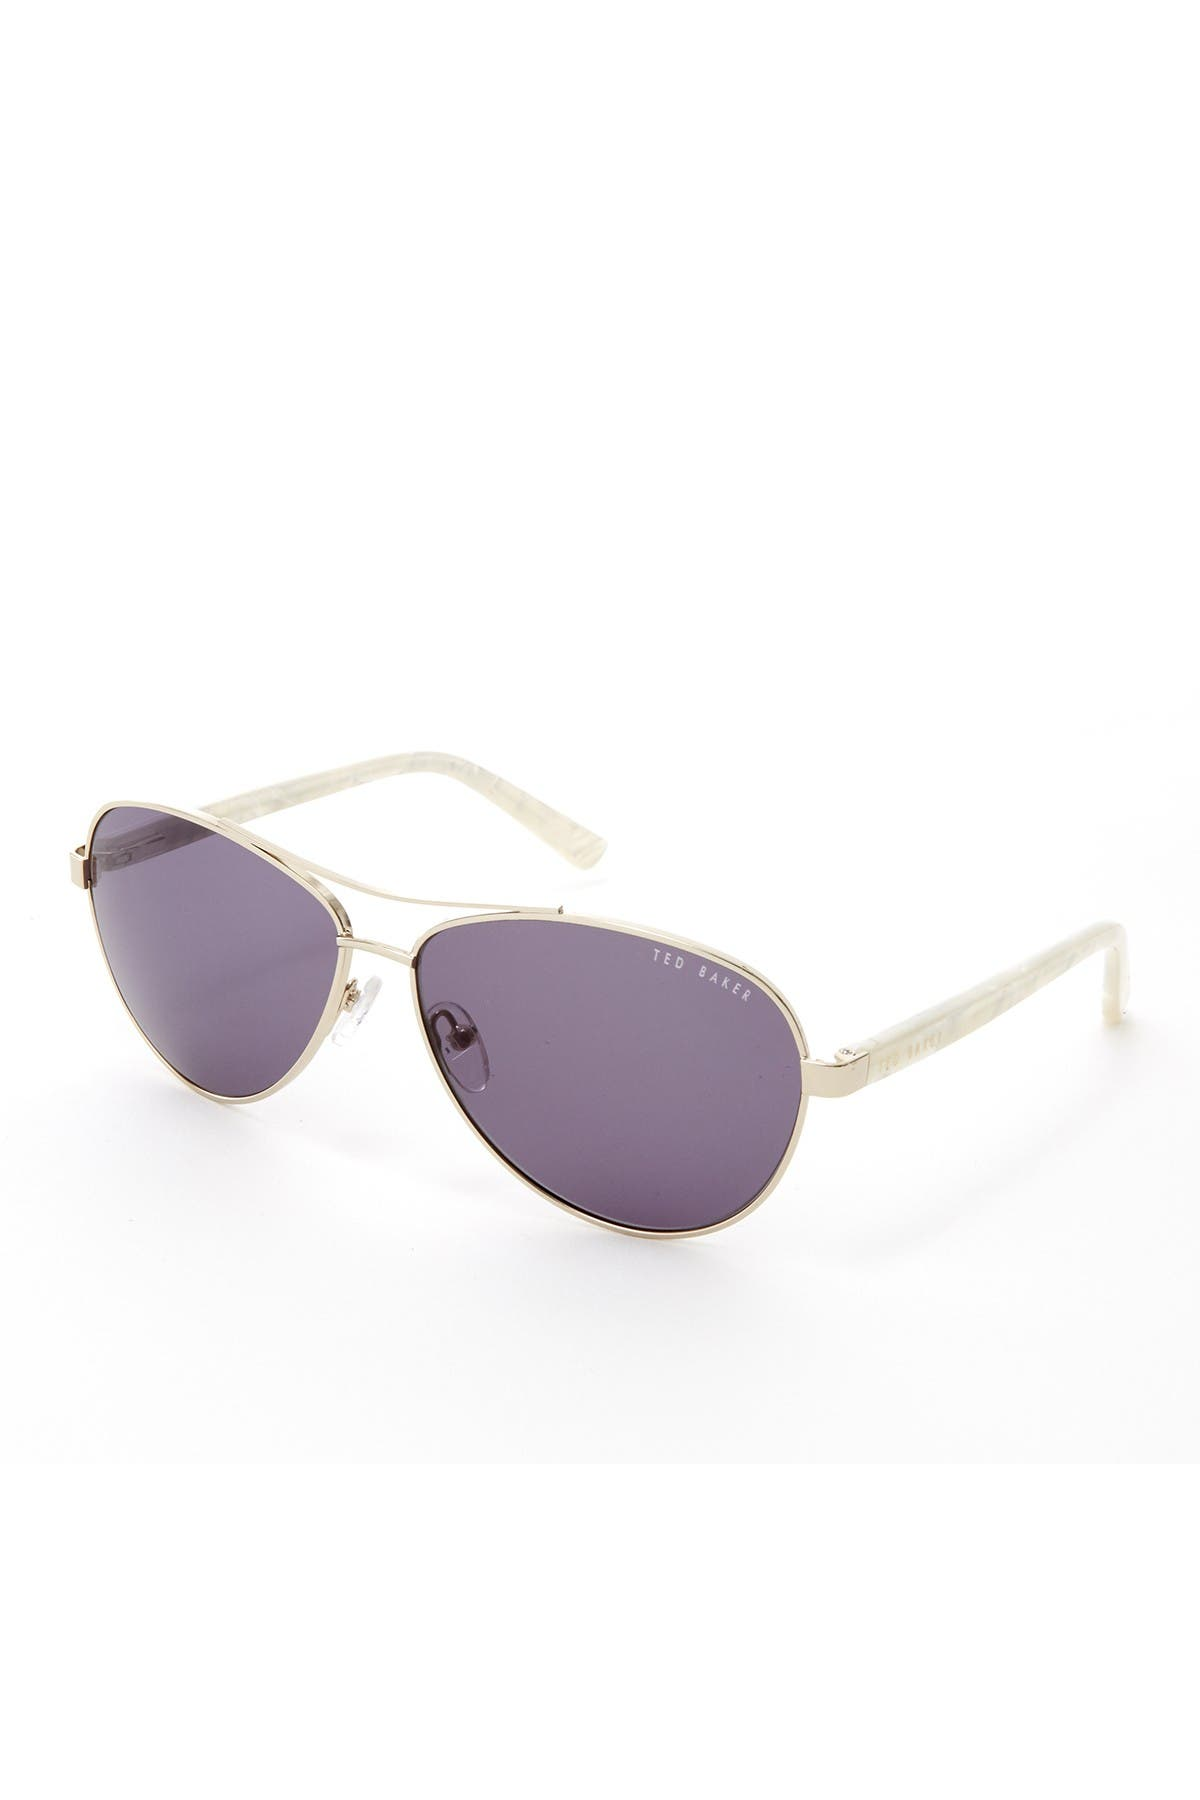 Image of Ted Baker London 60mm Metal Aviator Polarized Sunglasses